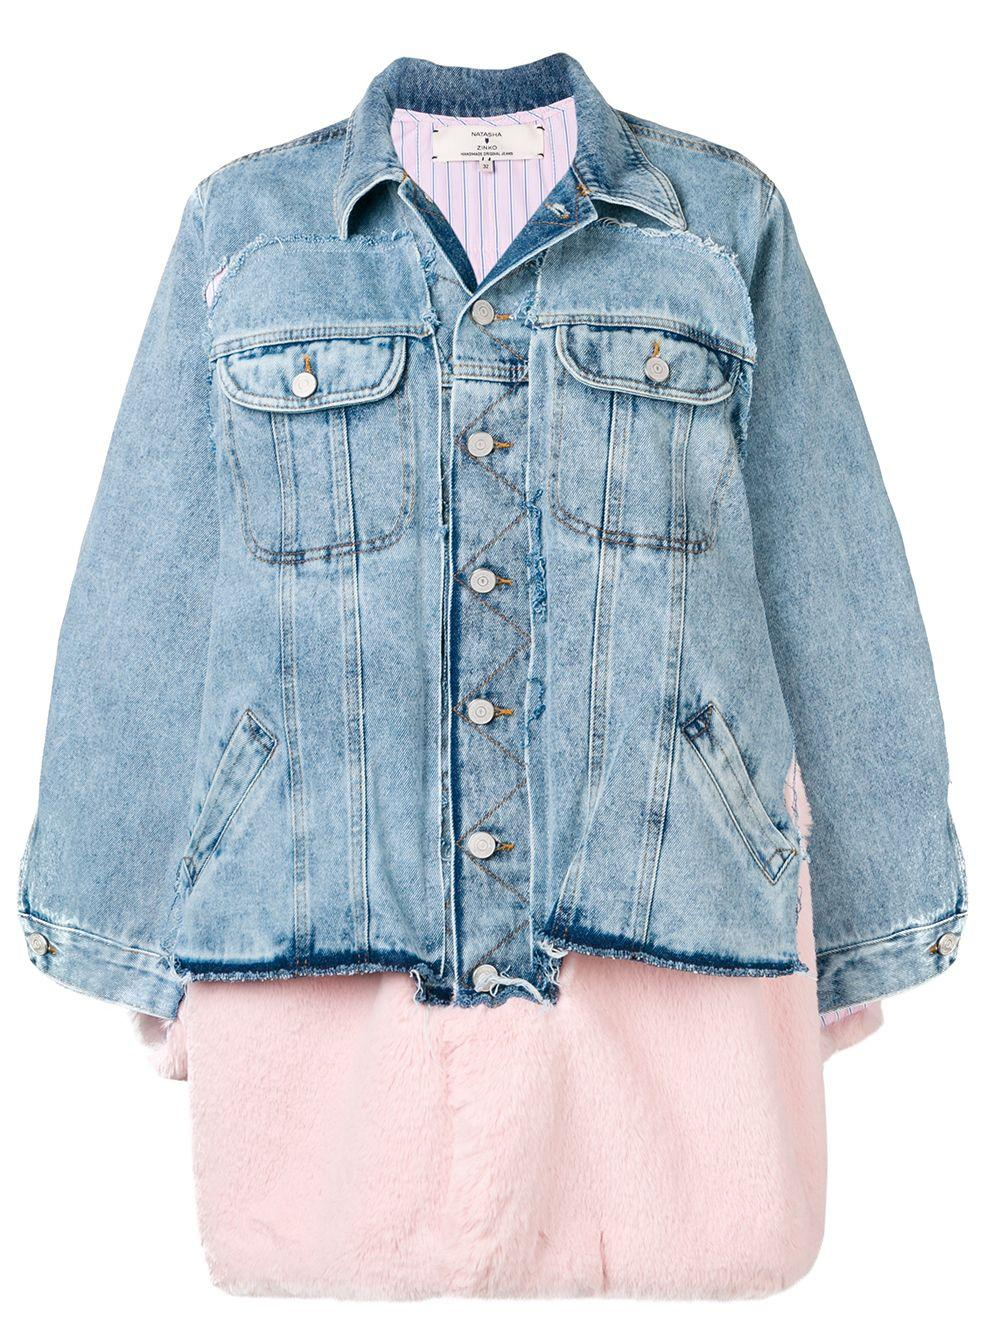 Natasha Zinko Redone Faux-Fur Trim Denim Jacket In Blue - Lyst